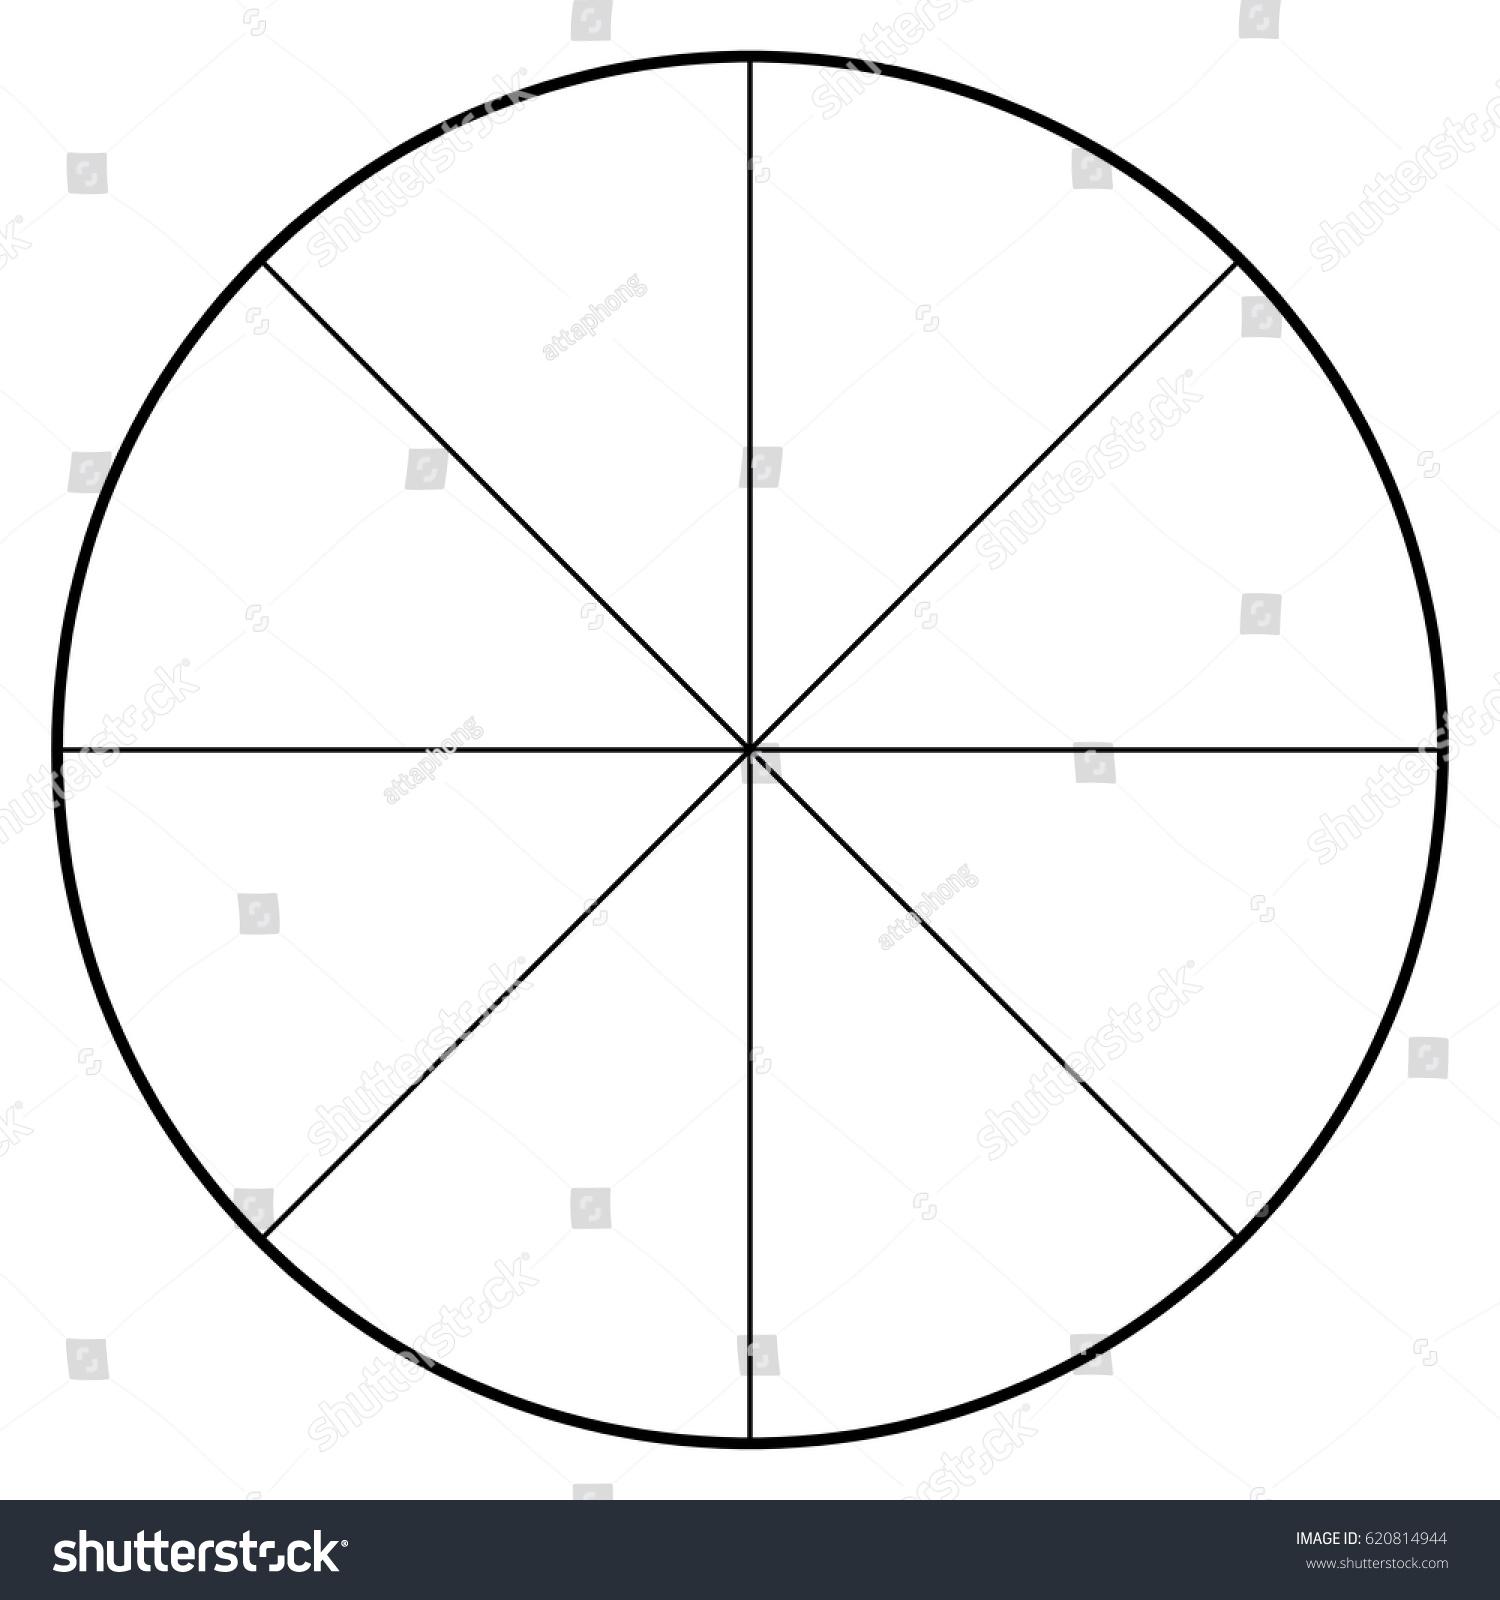 Blank polar graph paper protractor pie stock vector 620814944 blank polar graph paper protractor pie chart vector geenschuldenfo Image collections